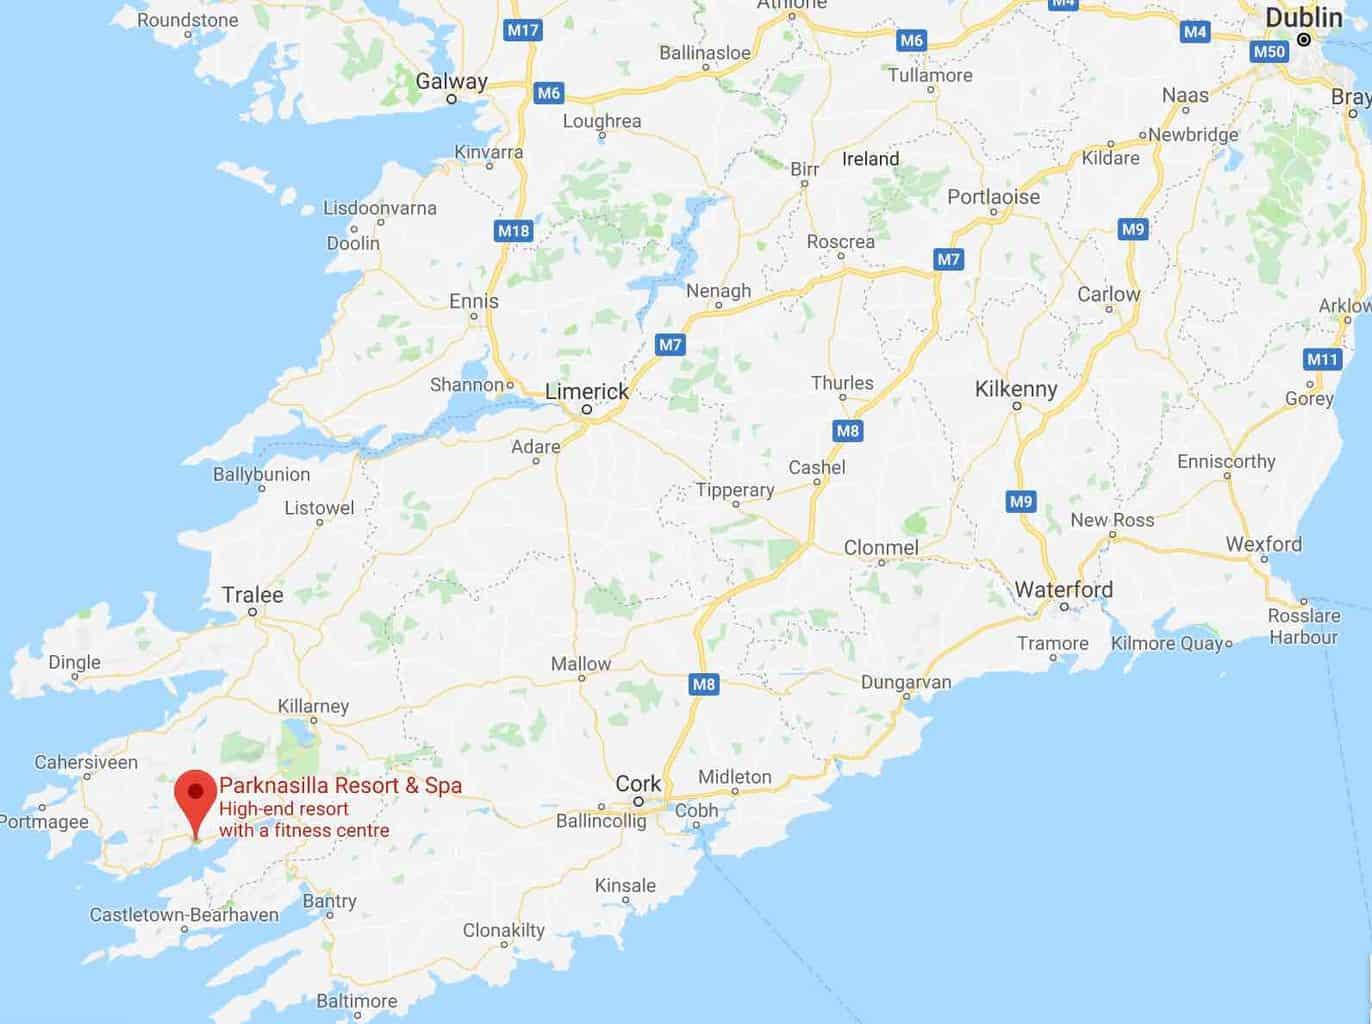 Parknasilla Resort & Spa Southern Ireland